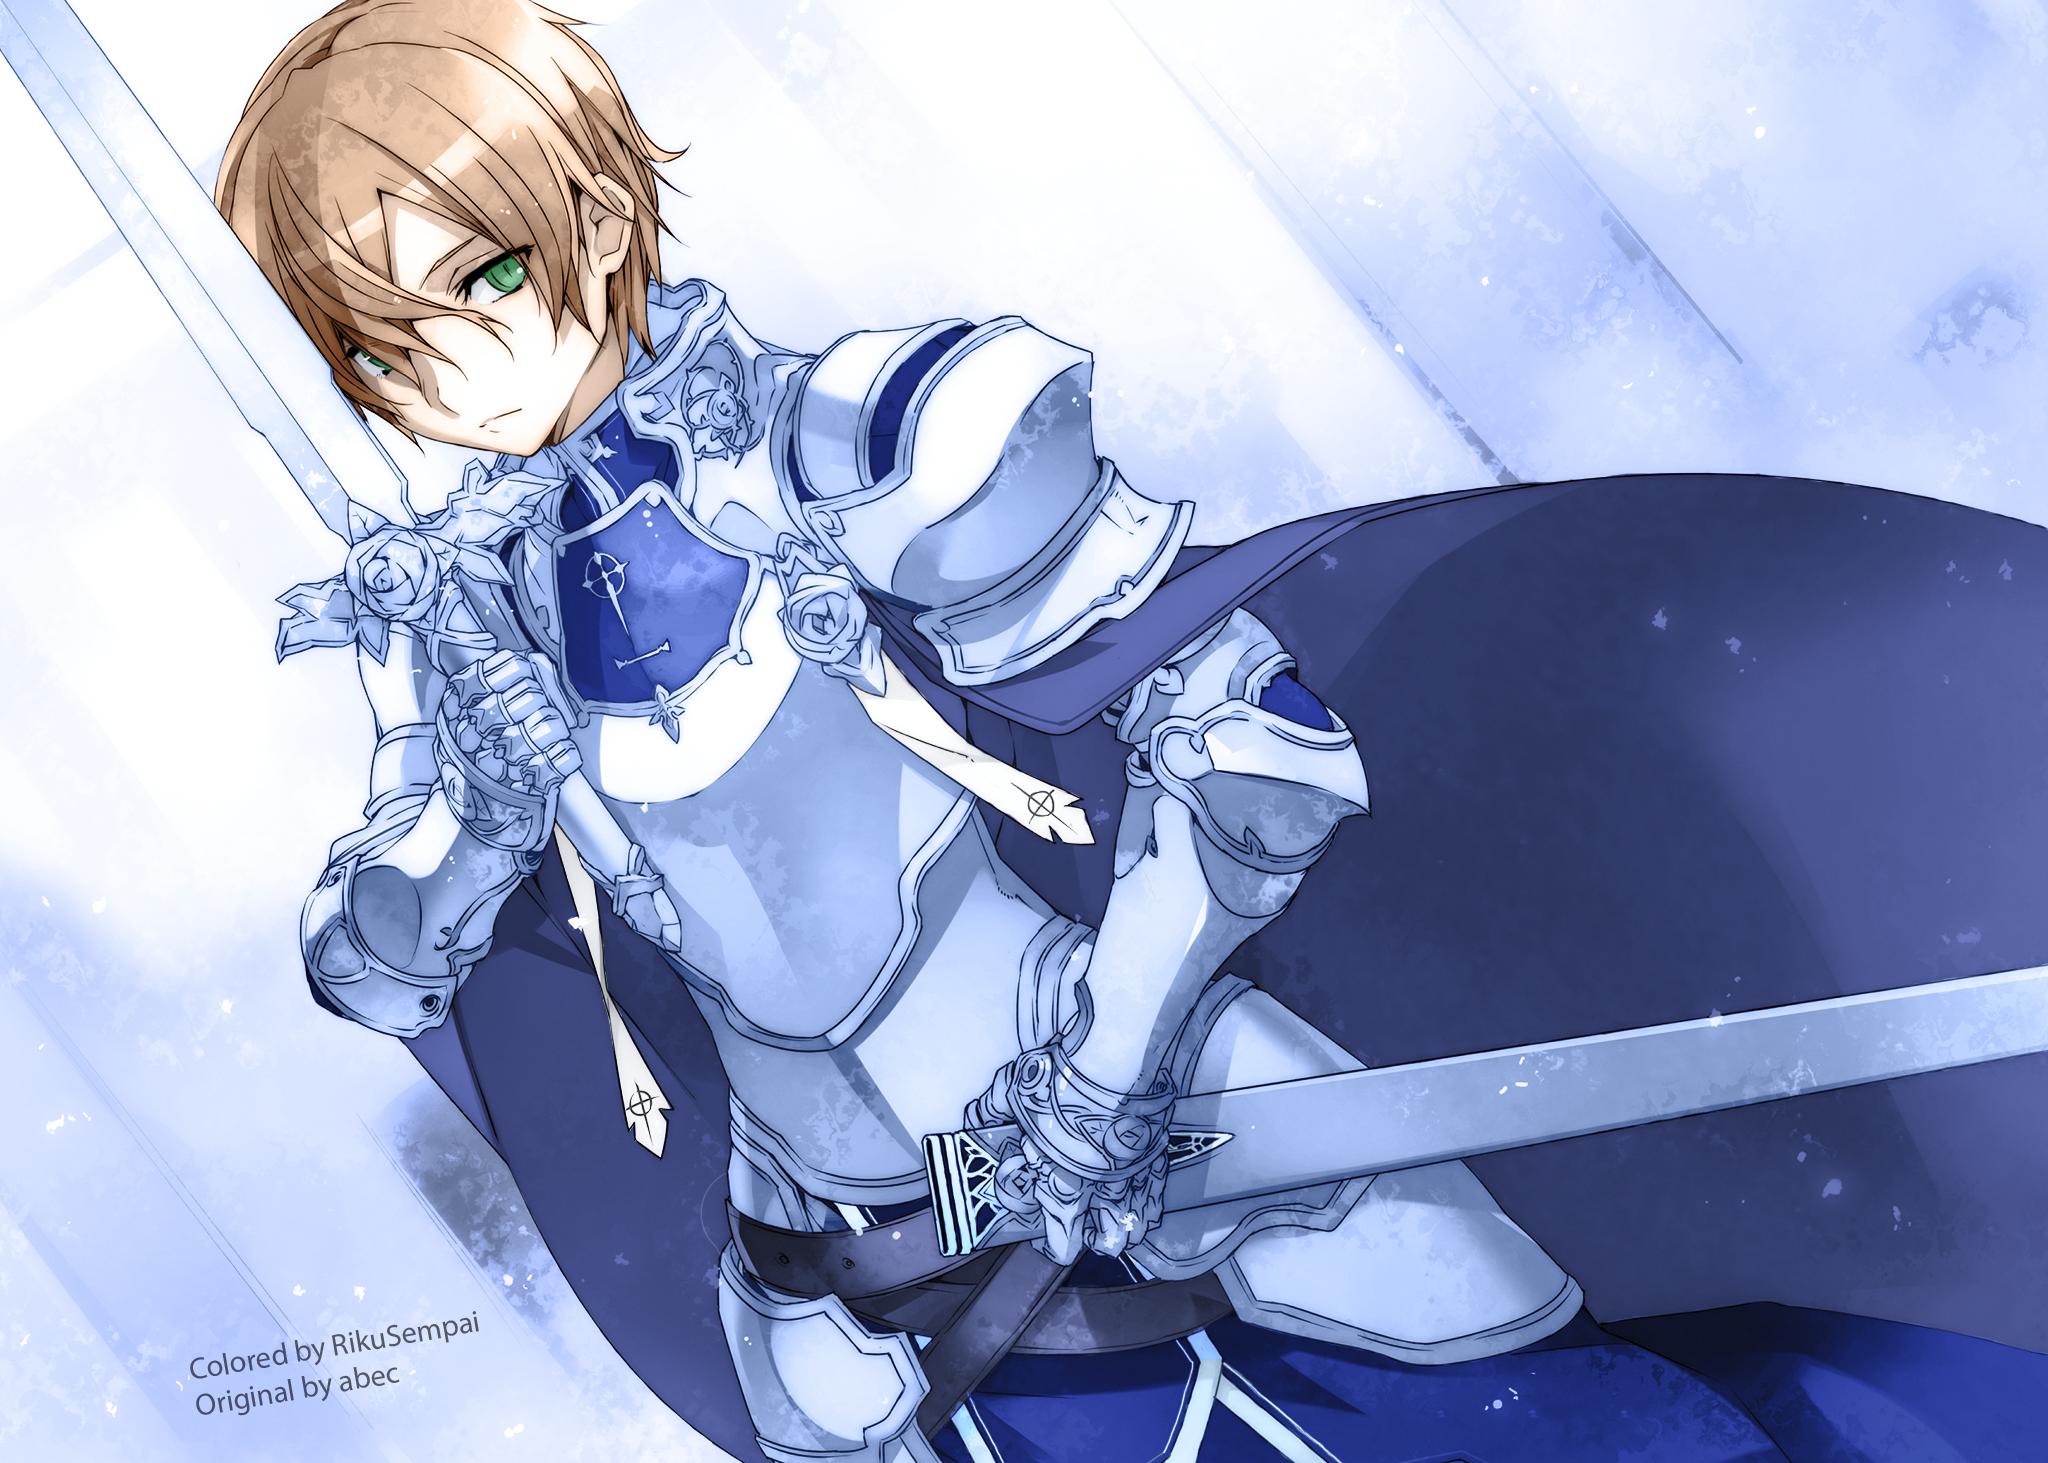 Sword art online full hd wallpaper and background image - Sword art online alicization wallpaper ...